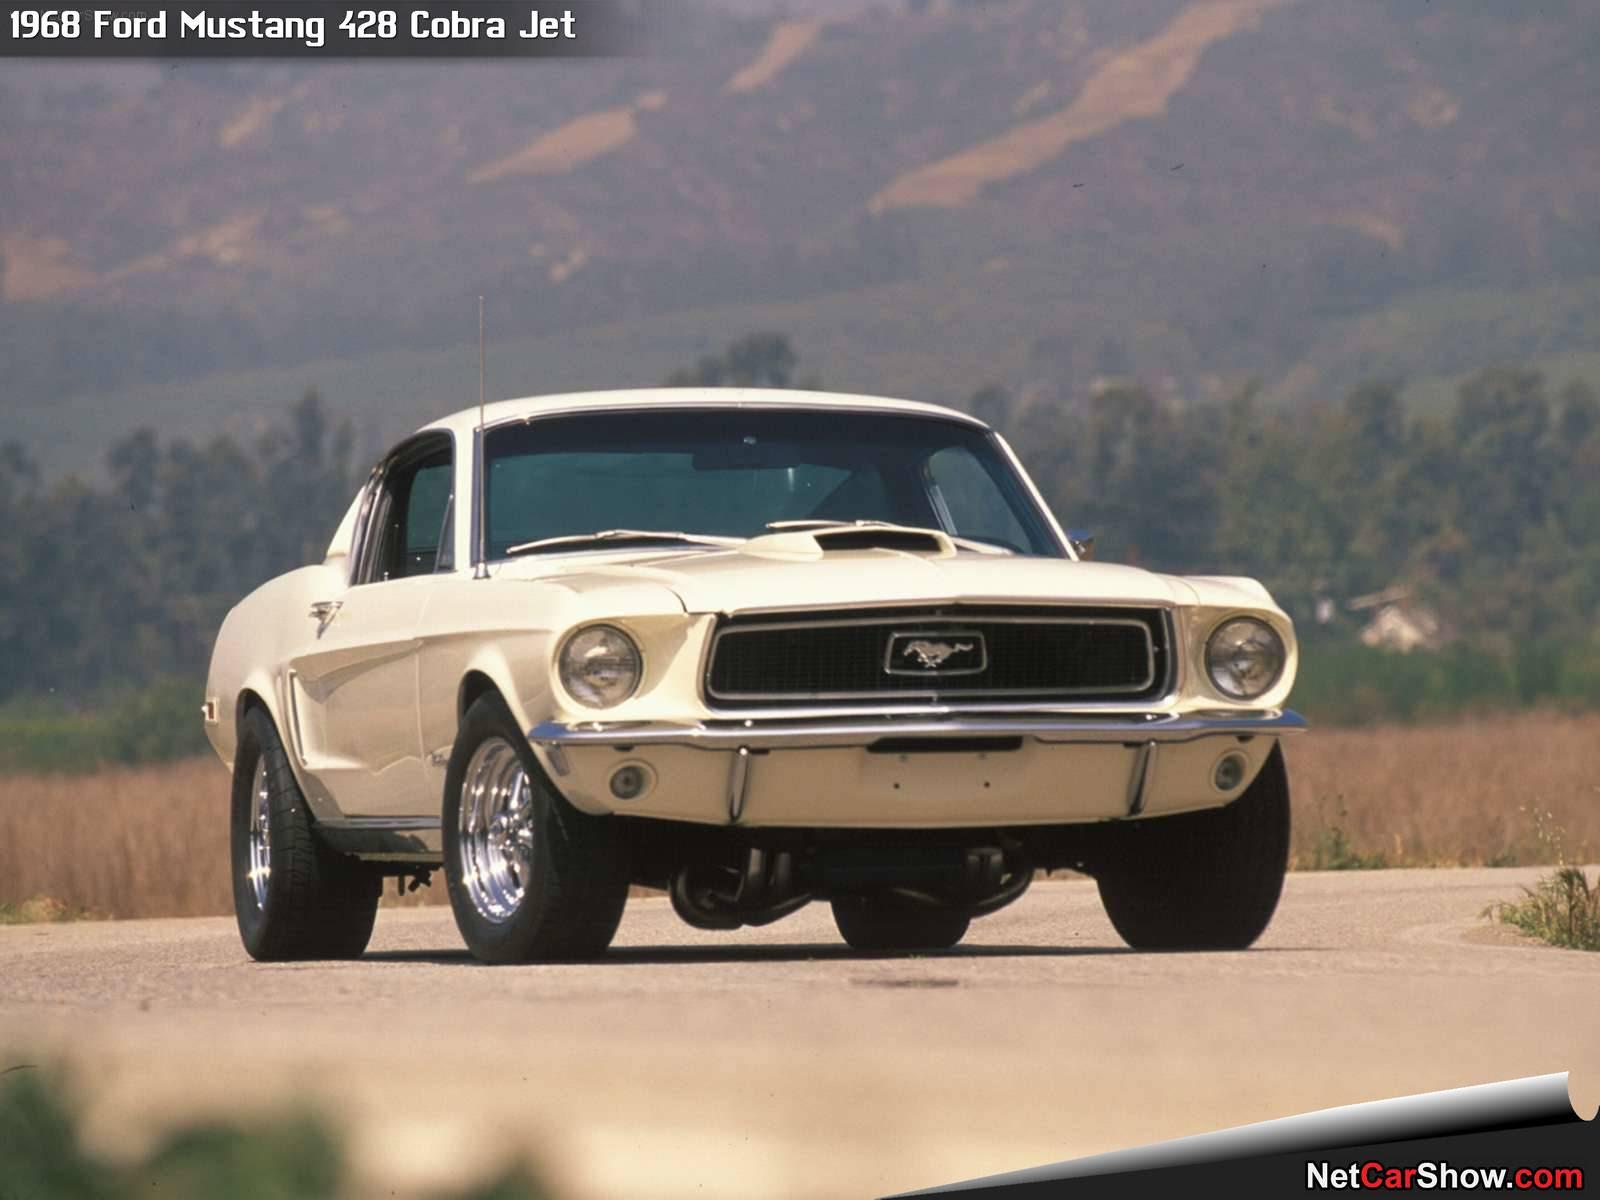 Ford Mustang 428 Cobra Jet (1968)